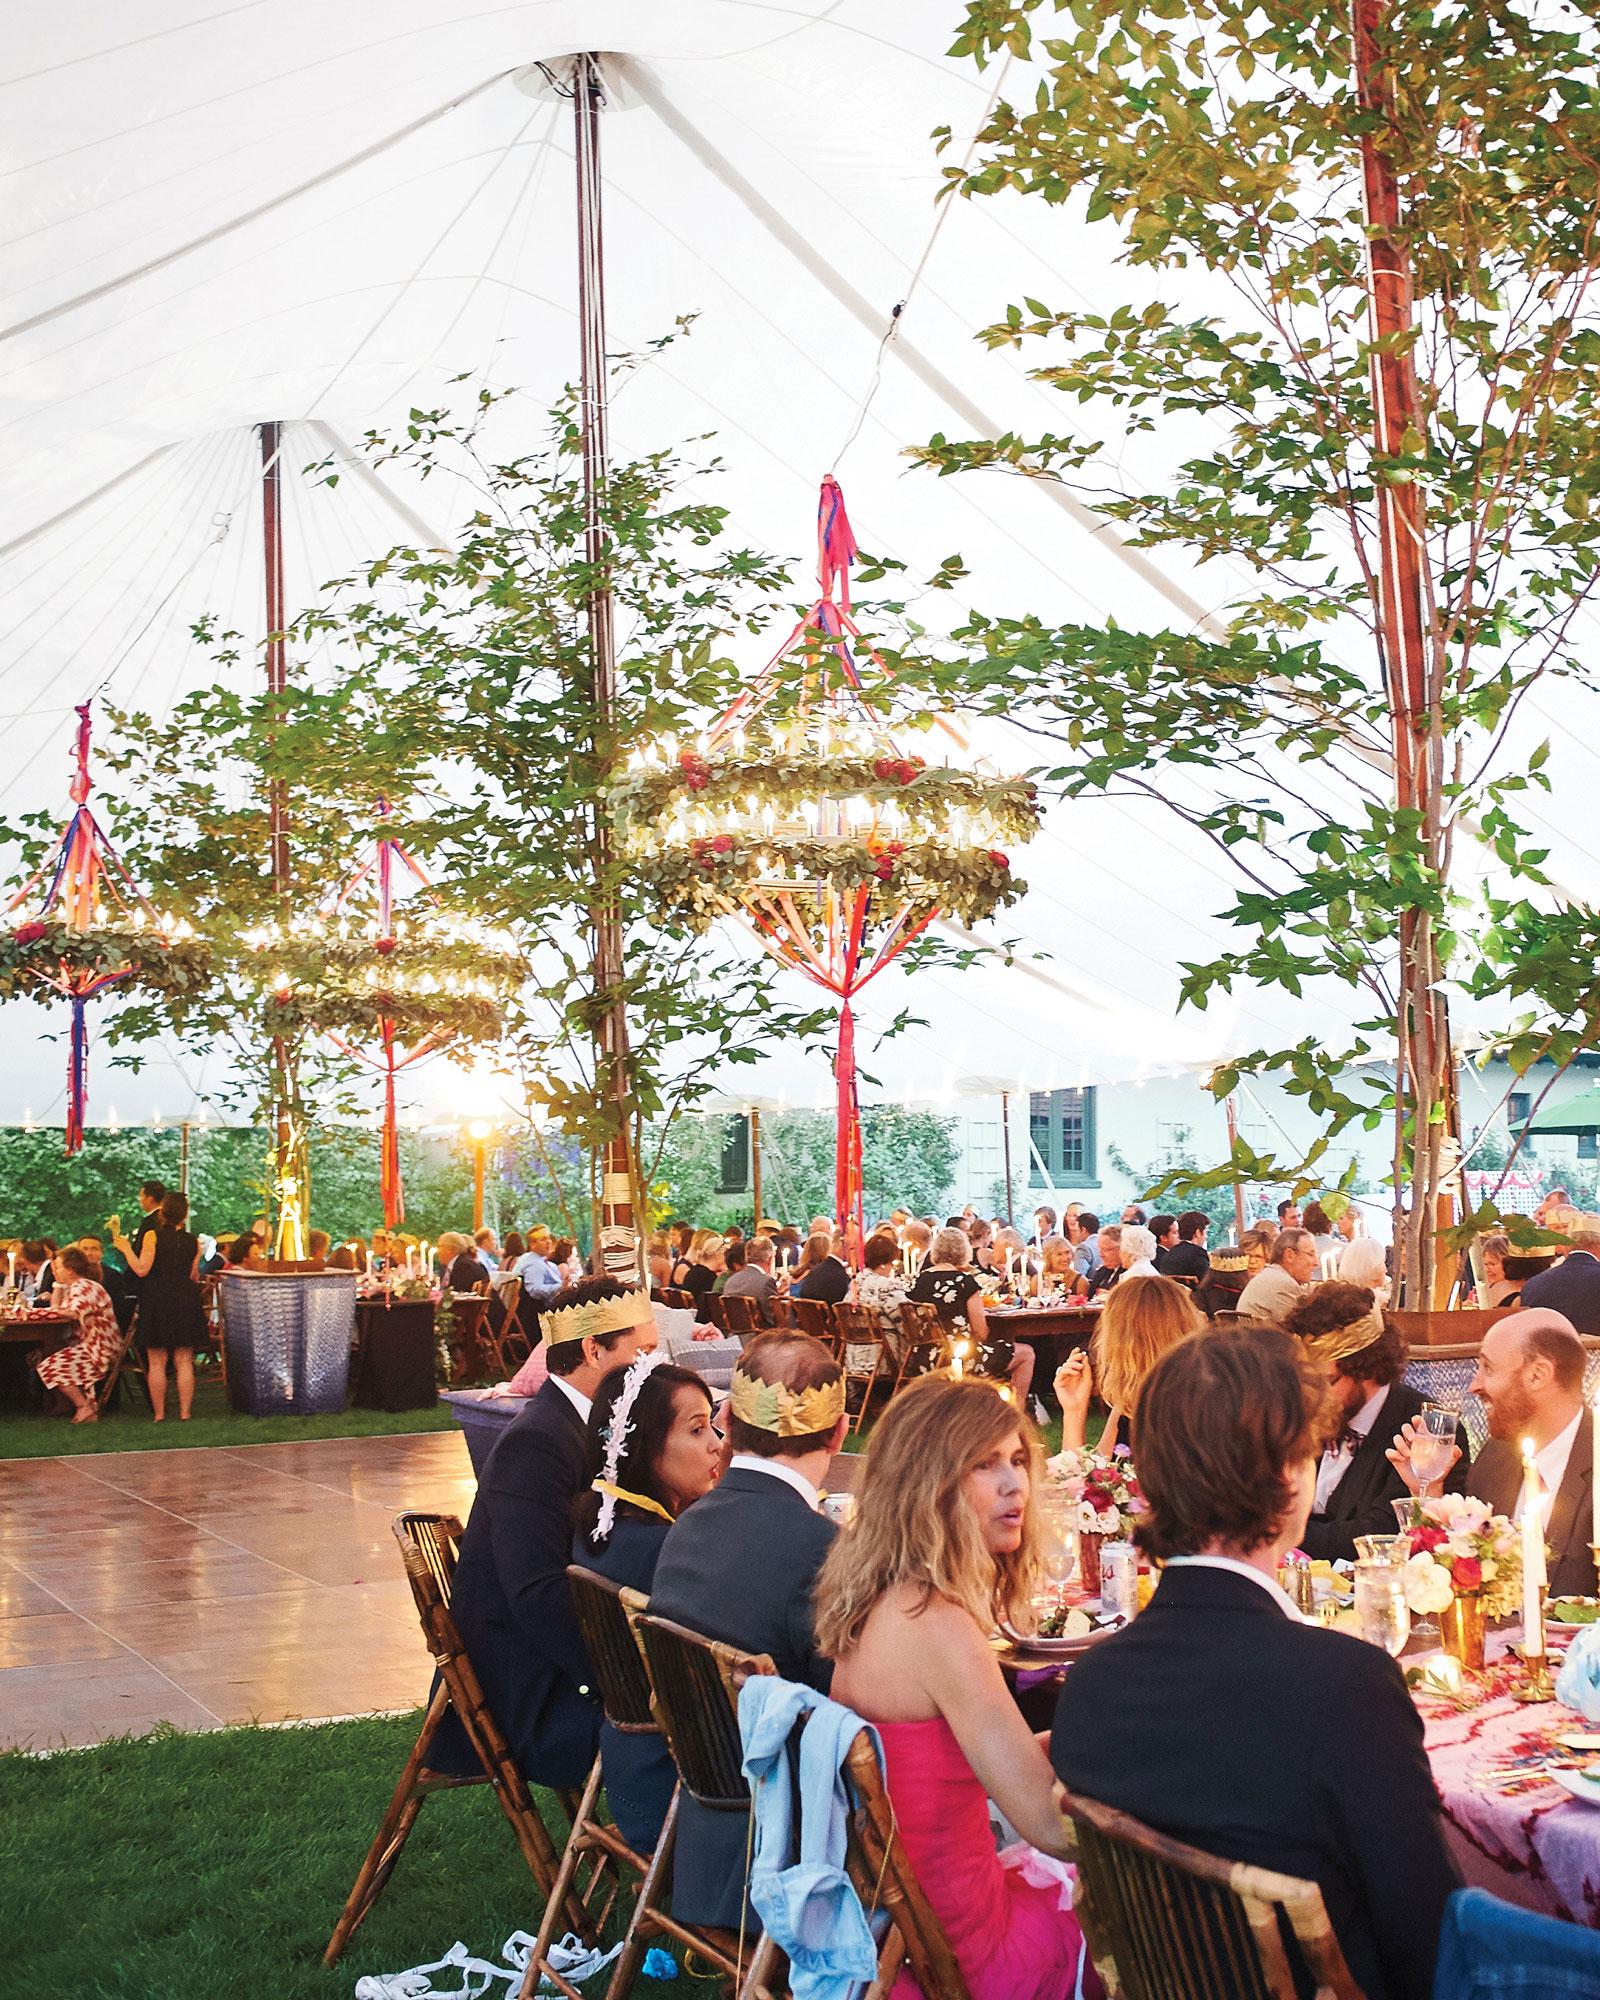 mfiona-peter-wedding-vermont-reception-venue-d3s.392.2015.47-d112512.jpg